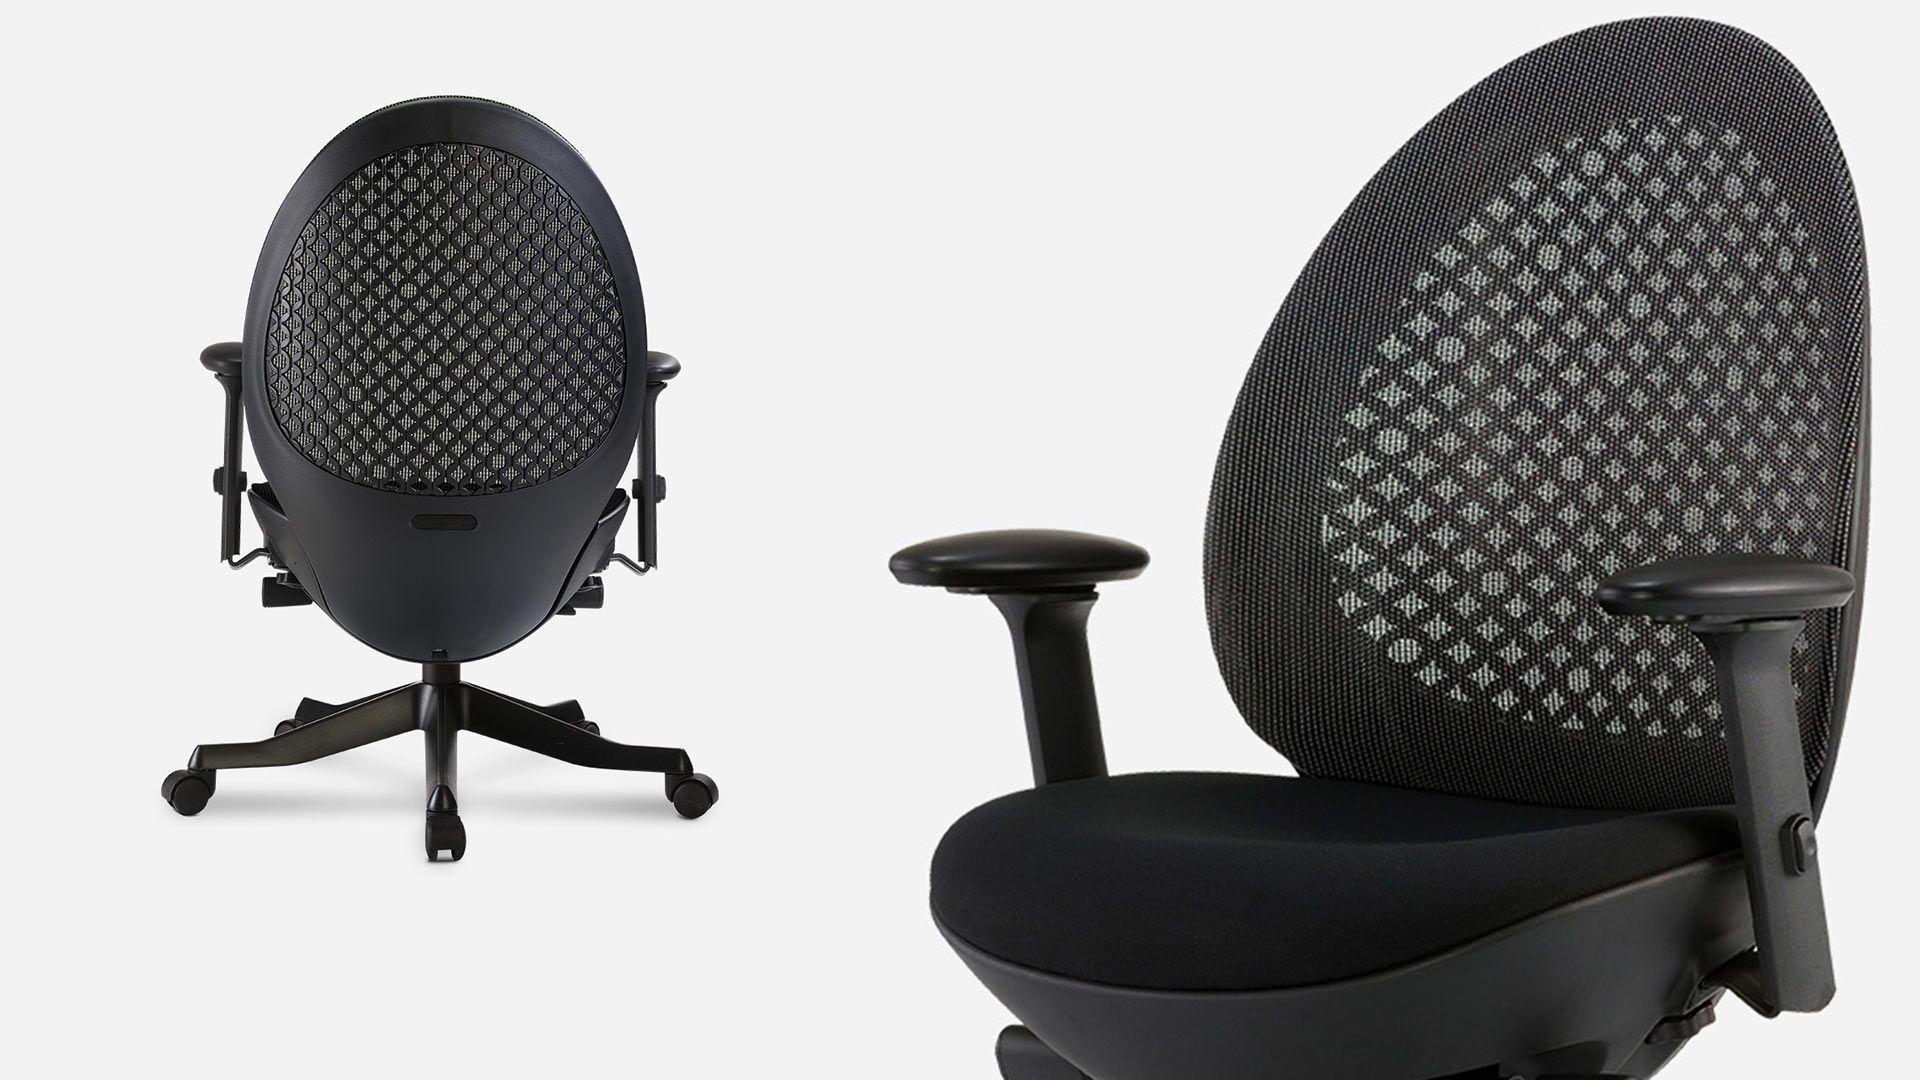 Avochair Eco Friendly Ergonomic Office Chairs Office Chair Ergonomic Office Chair Chair